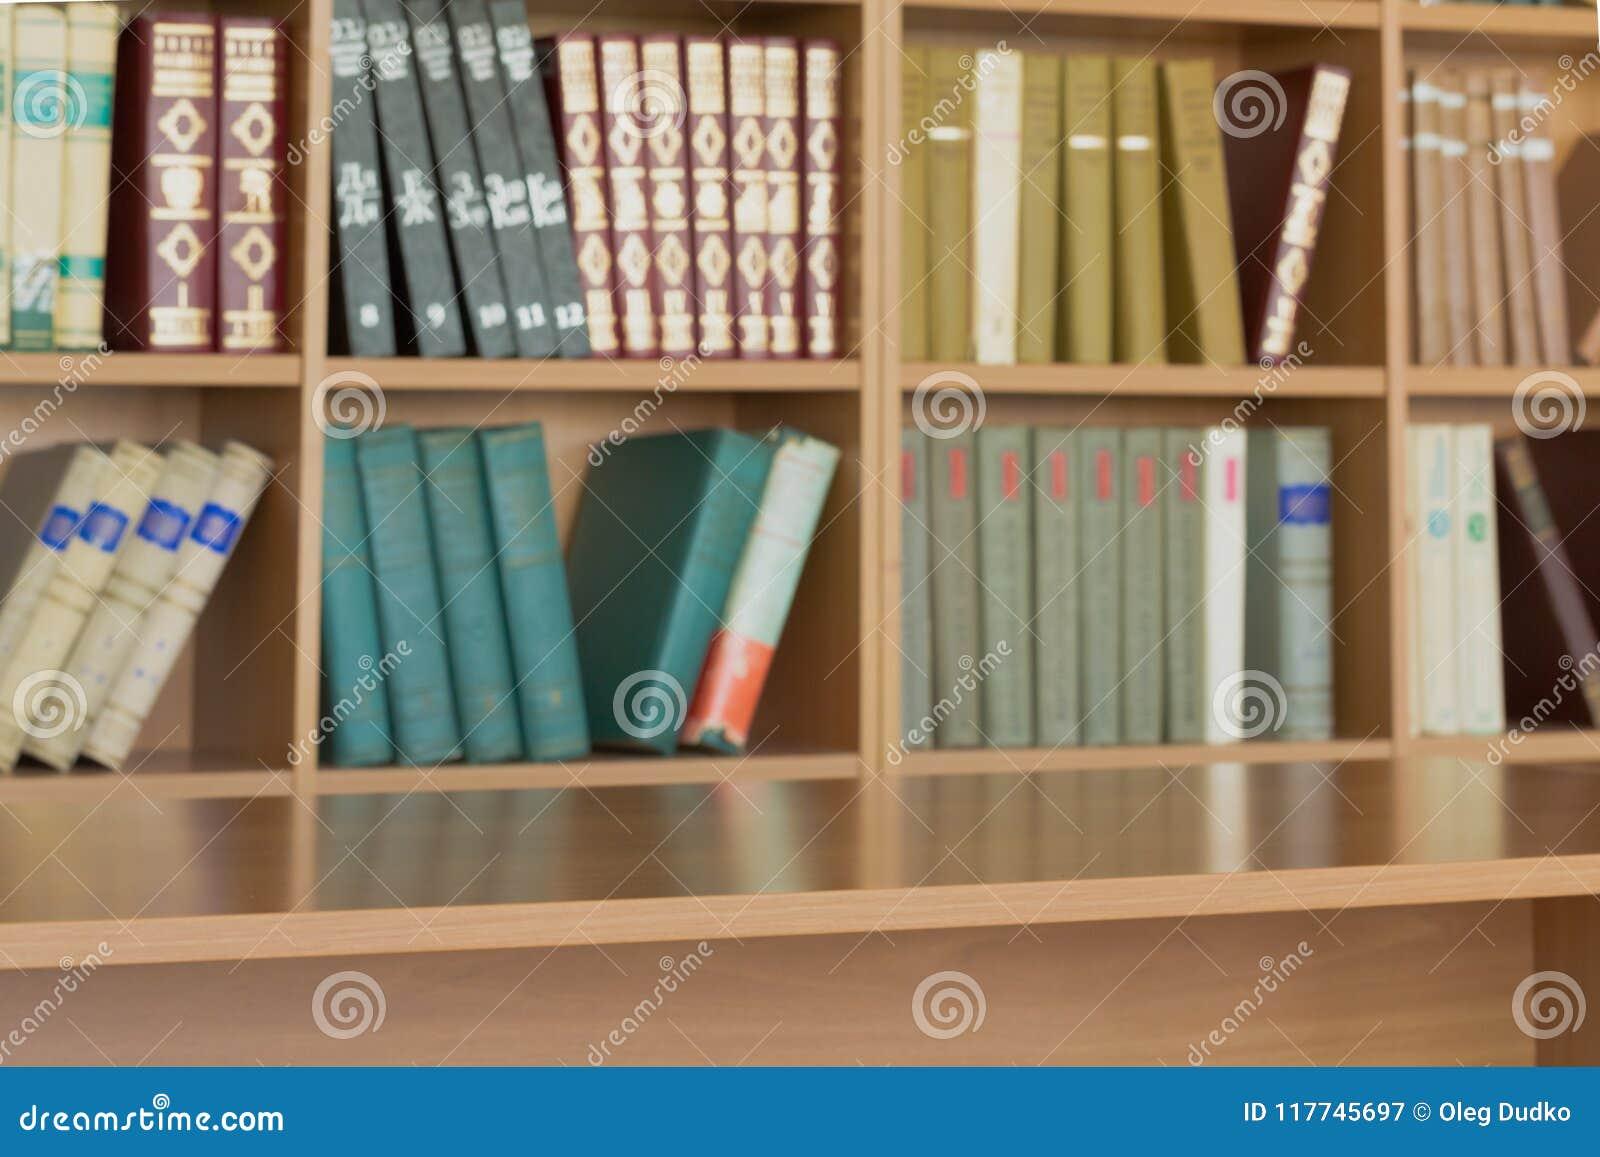 Blur Blurred Book Store Classroom Bookshelf Background